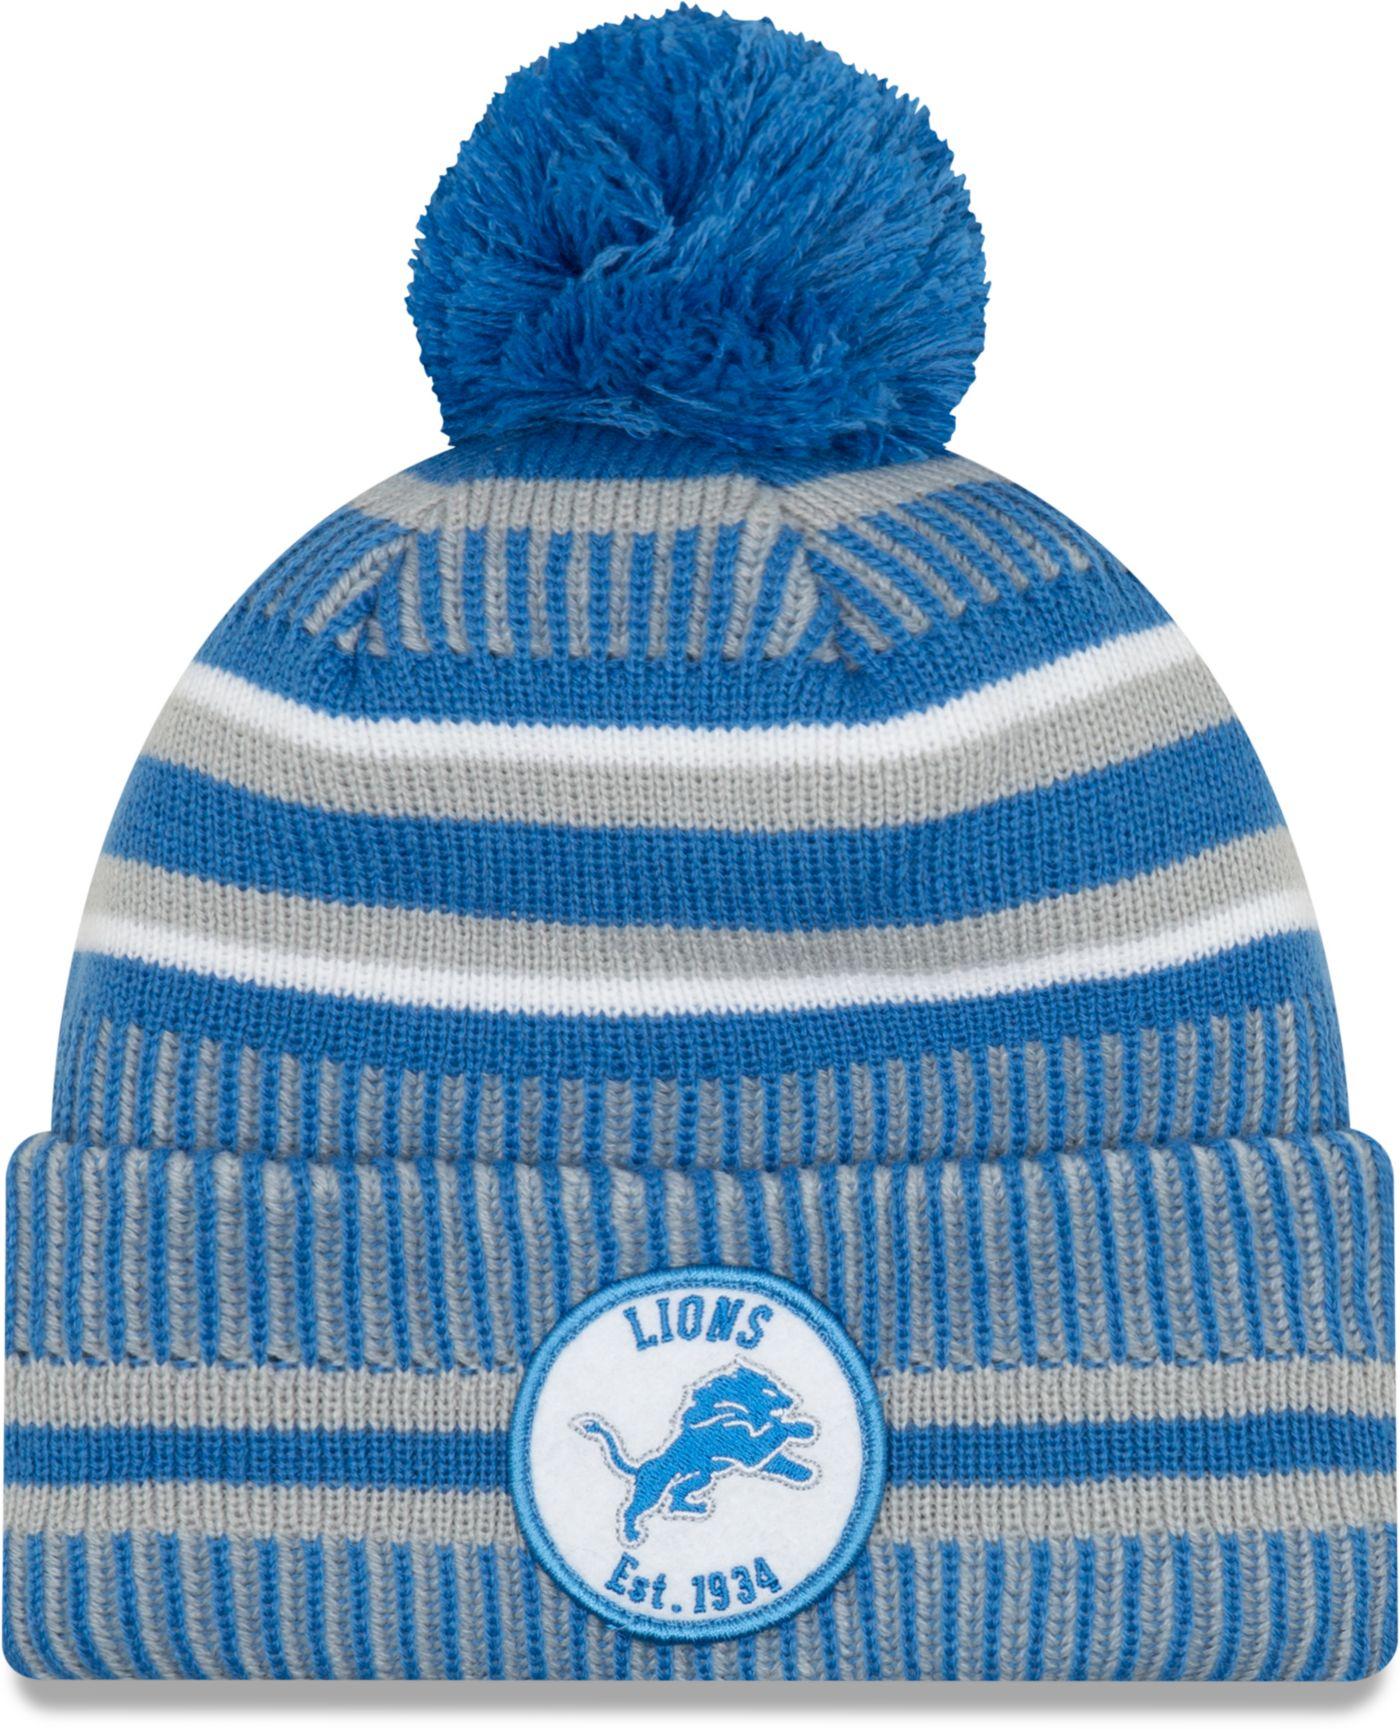 New Era Men's Detroit Lions Sideline Home Sport Pom Knit